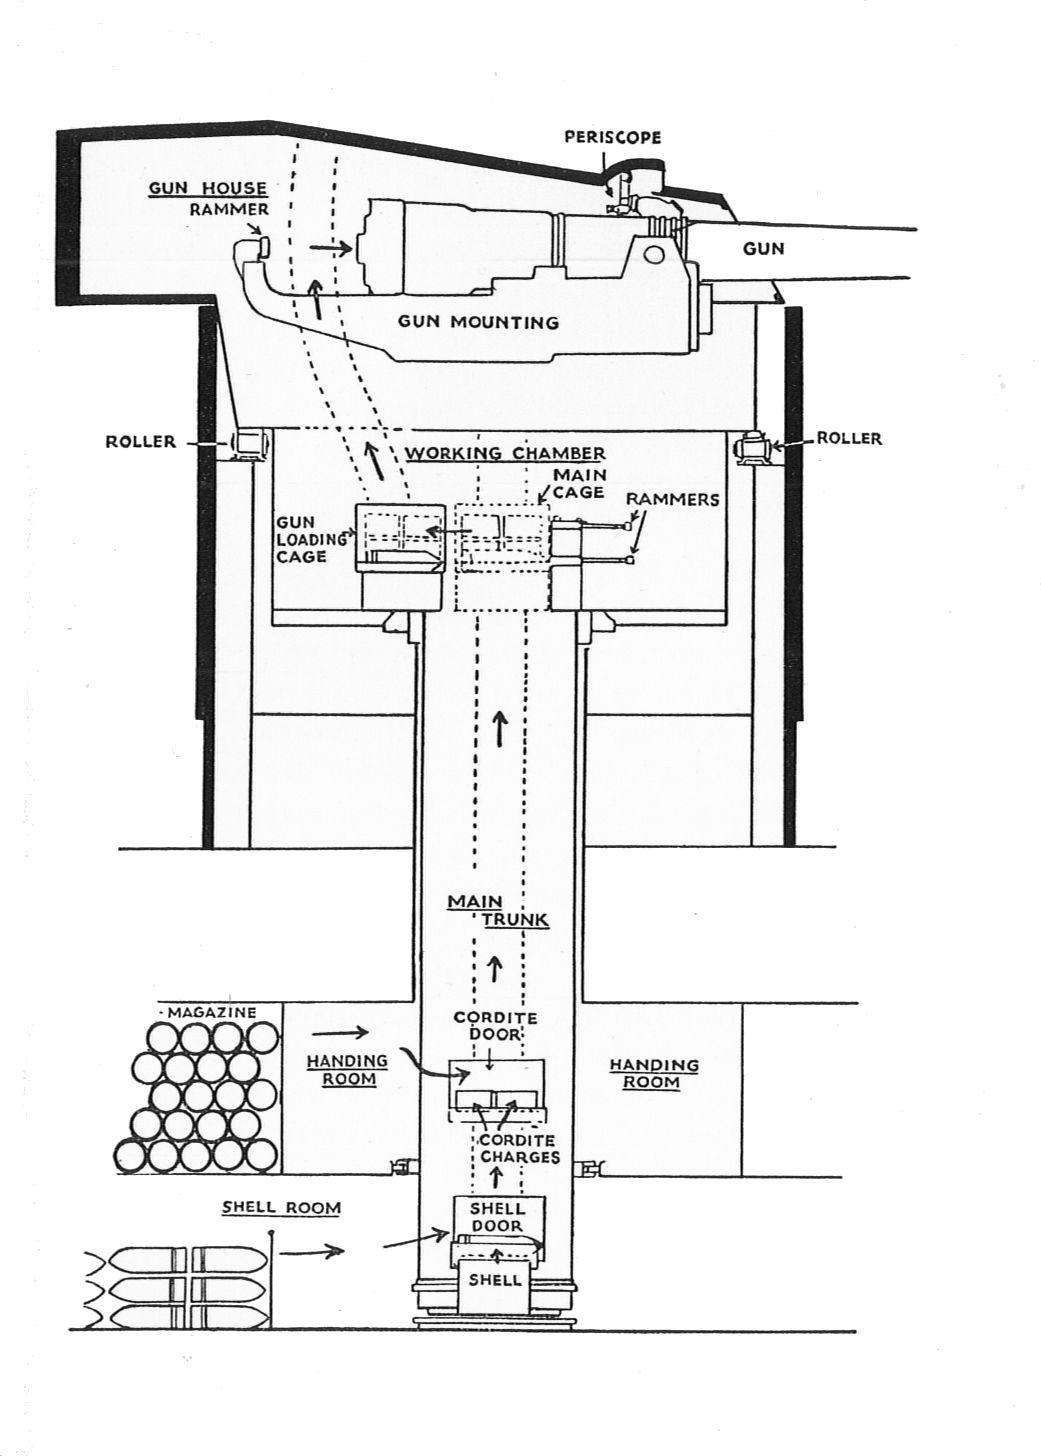 Файл:Warship barbette and gunhouse (Warships To-day, 1936).jpg